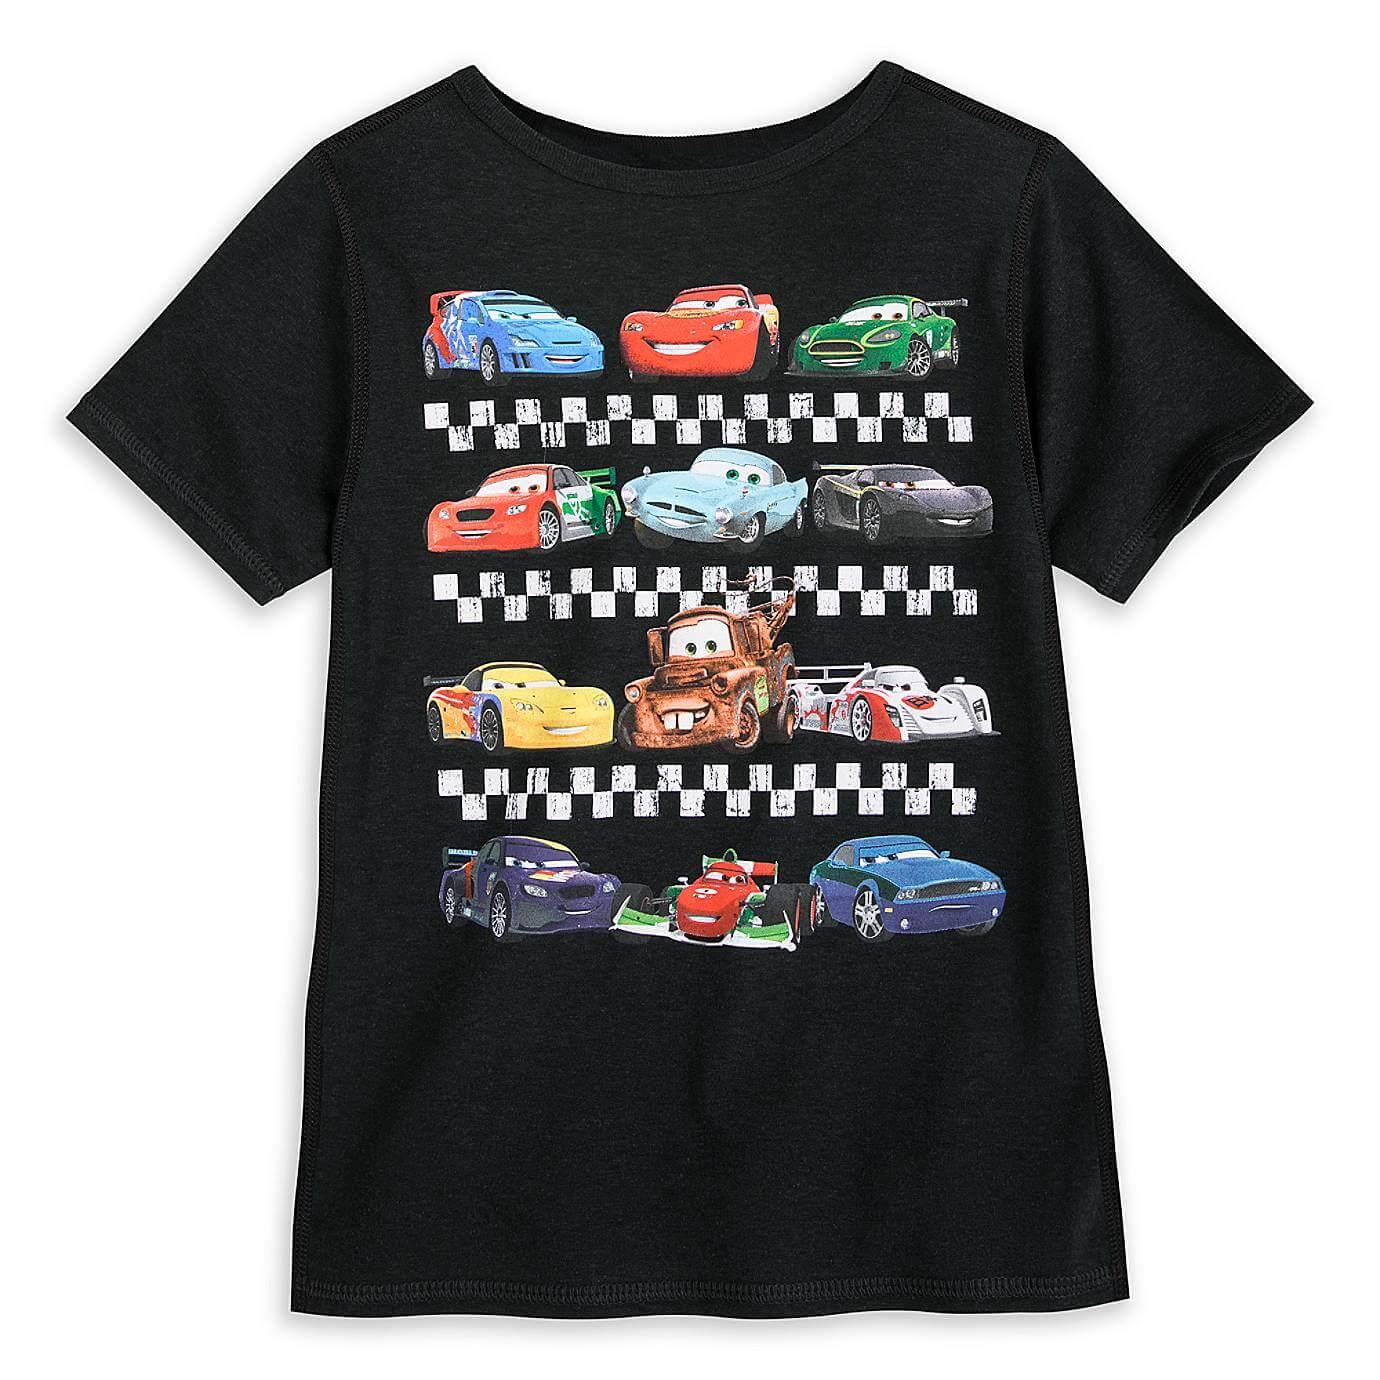 T-Shirt for Kids – Sensory Friendly